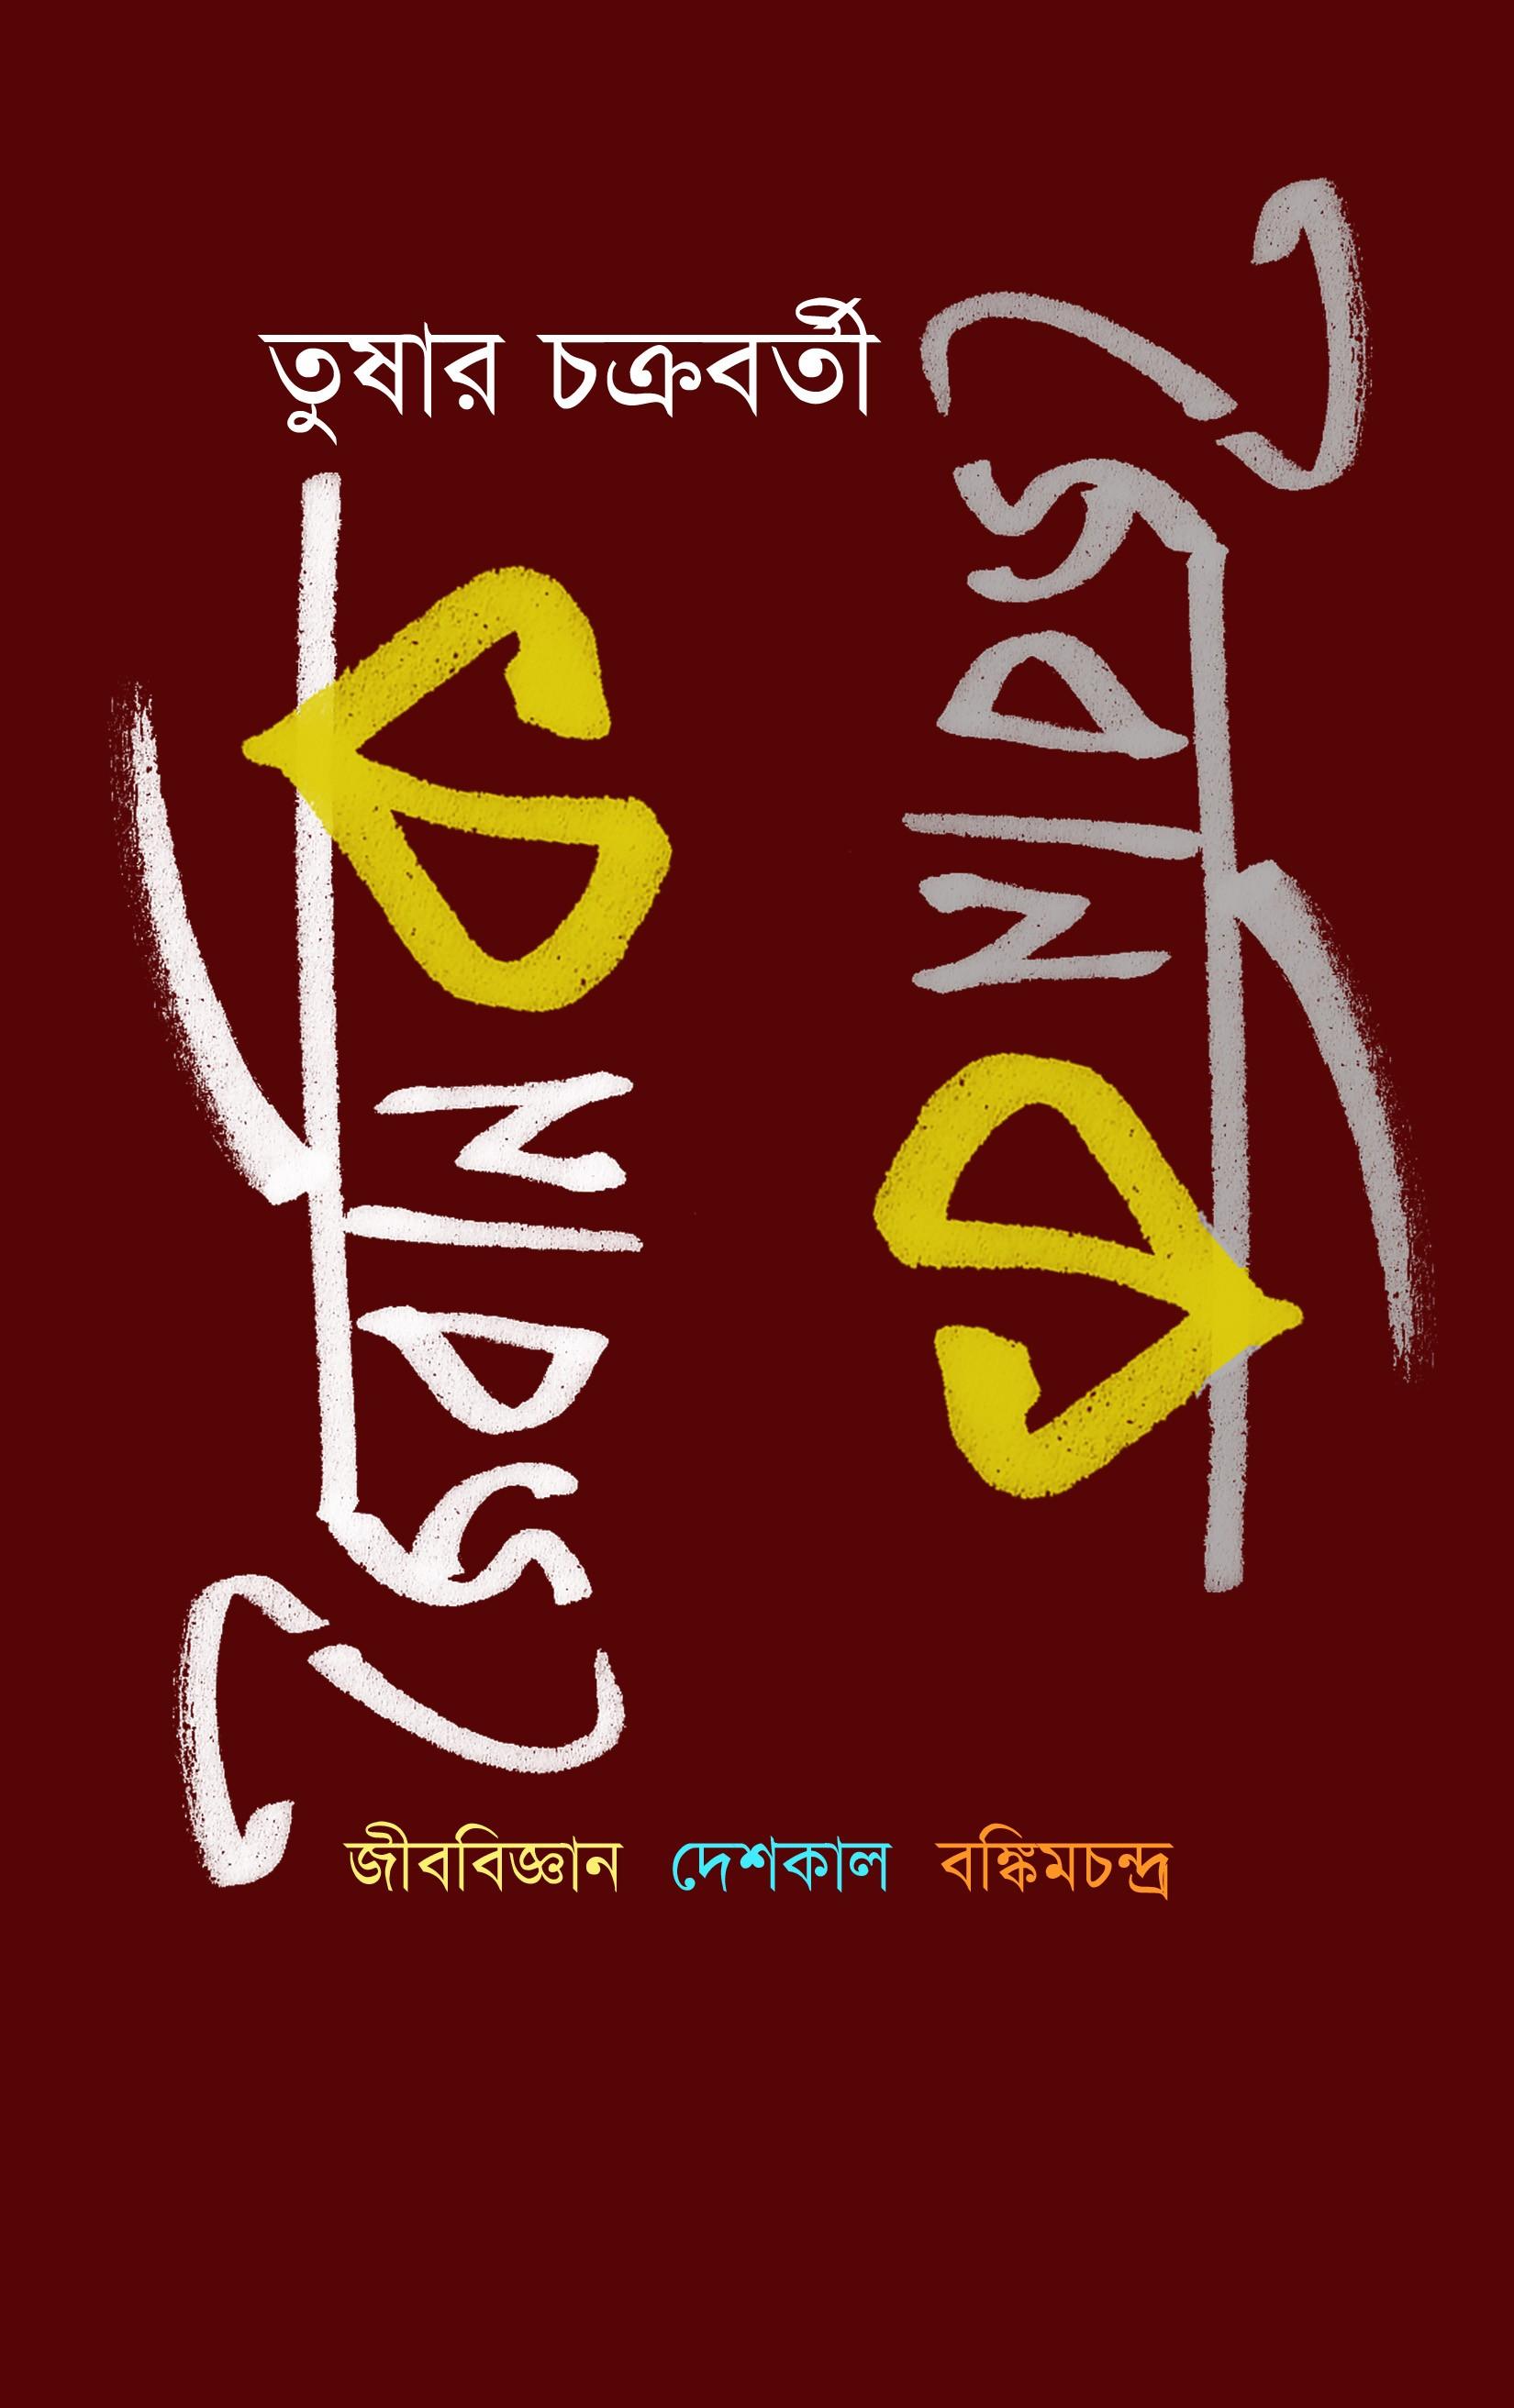 JAIBANIK : Jibobijnan, Deshkal, Bankimchandra